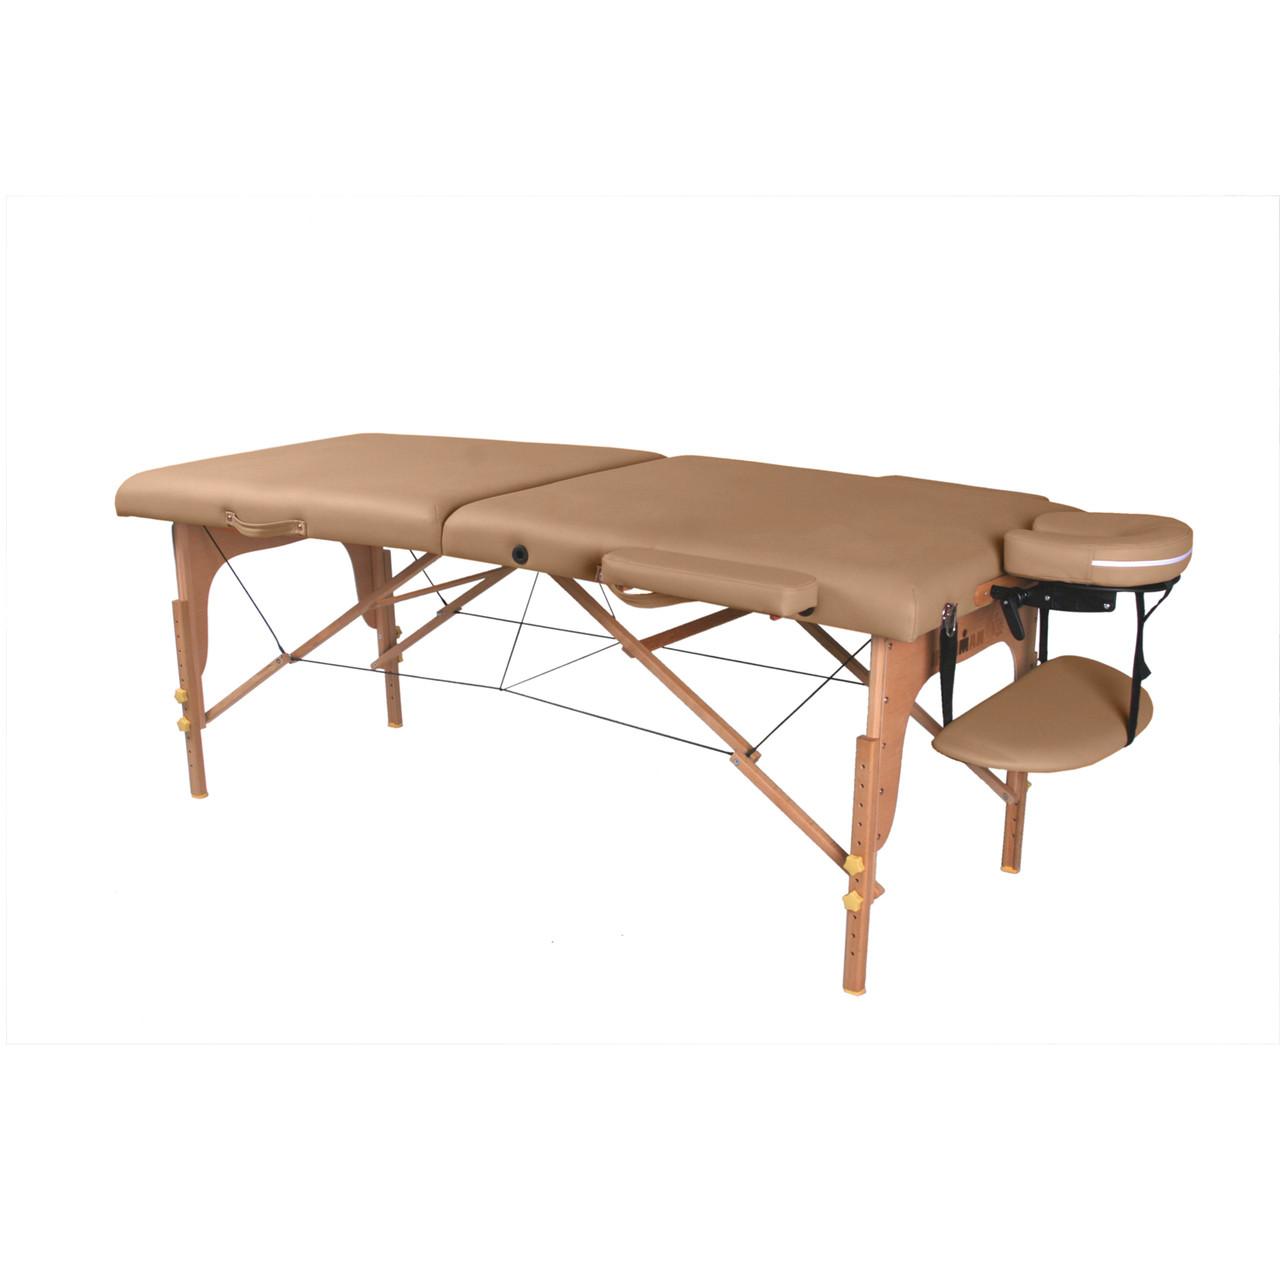 IRONMAN® Santa Cruz Massage Table